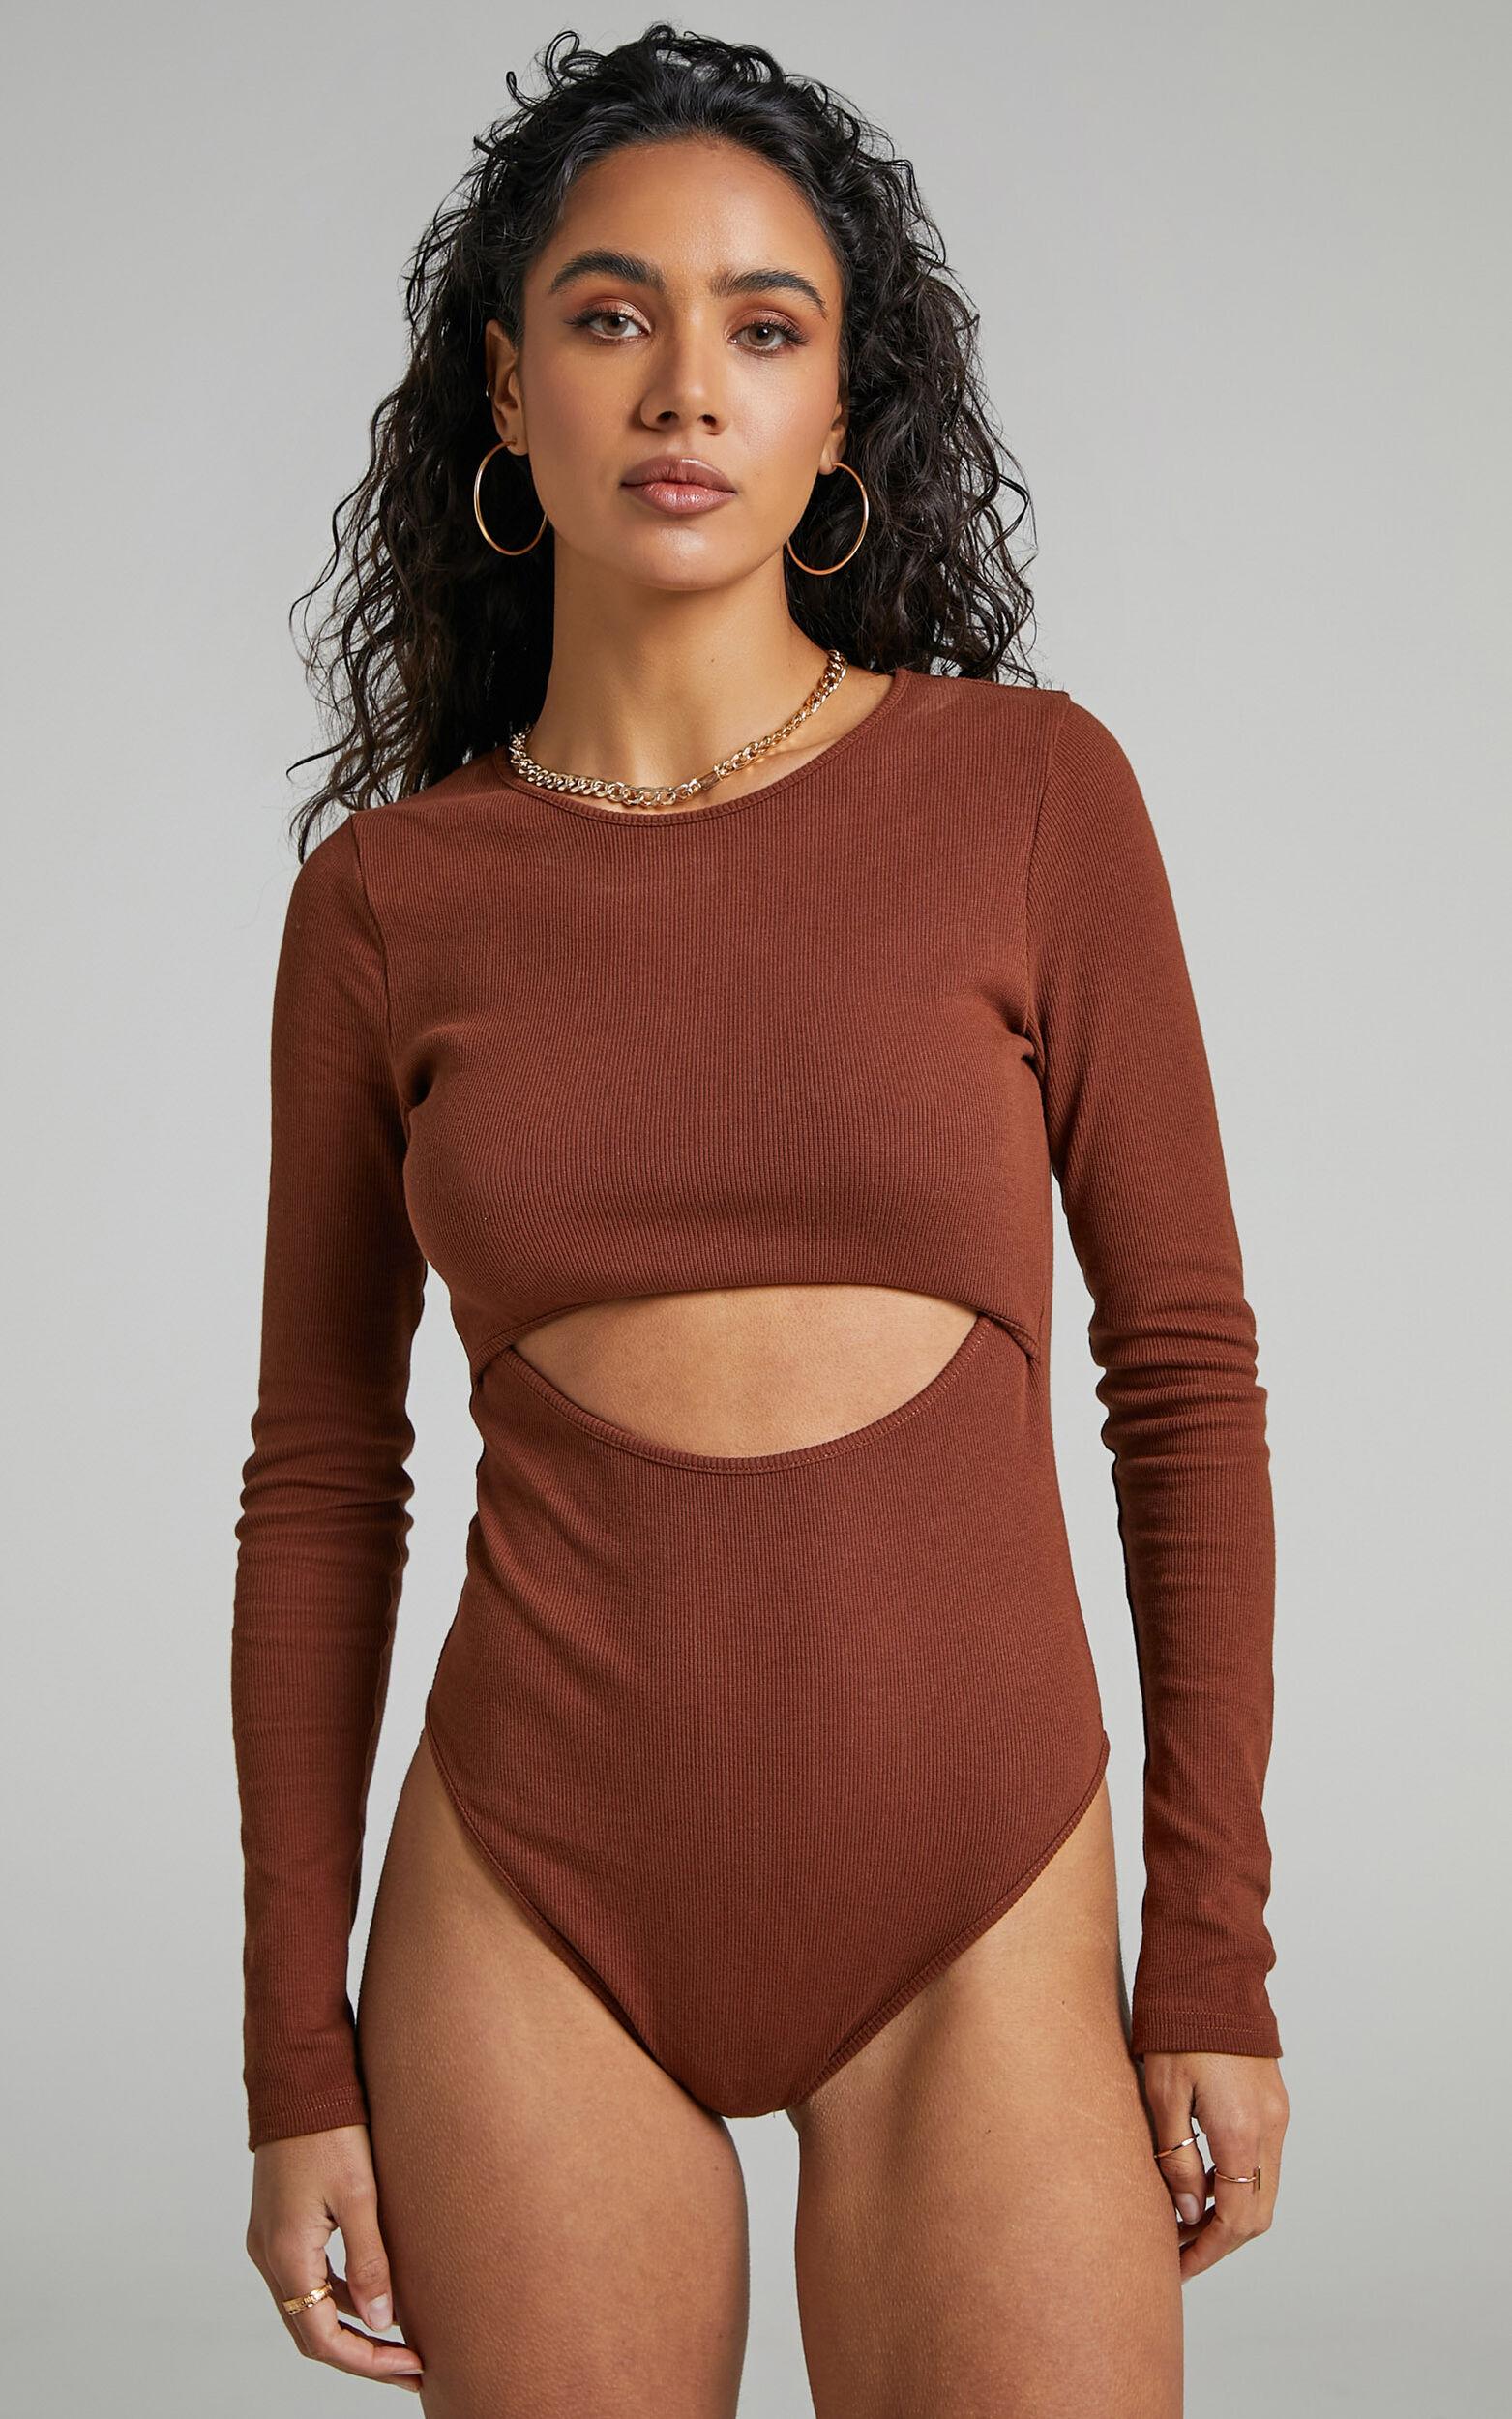 Mavis Long Sleeve Bodysuit in Chocolate - 06, BRN1, super-hi-res image number null